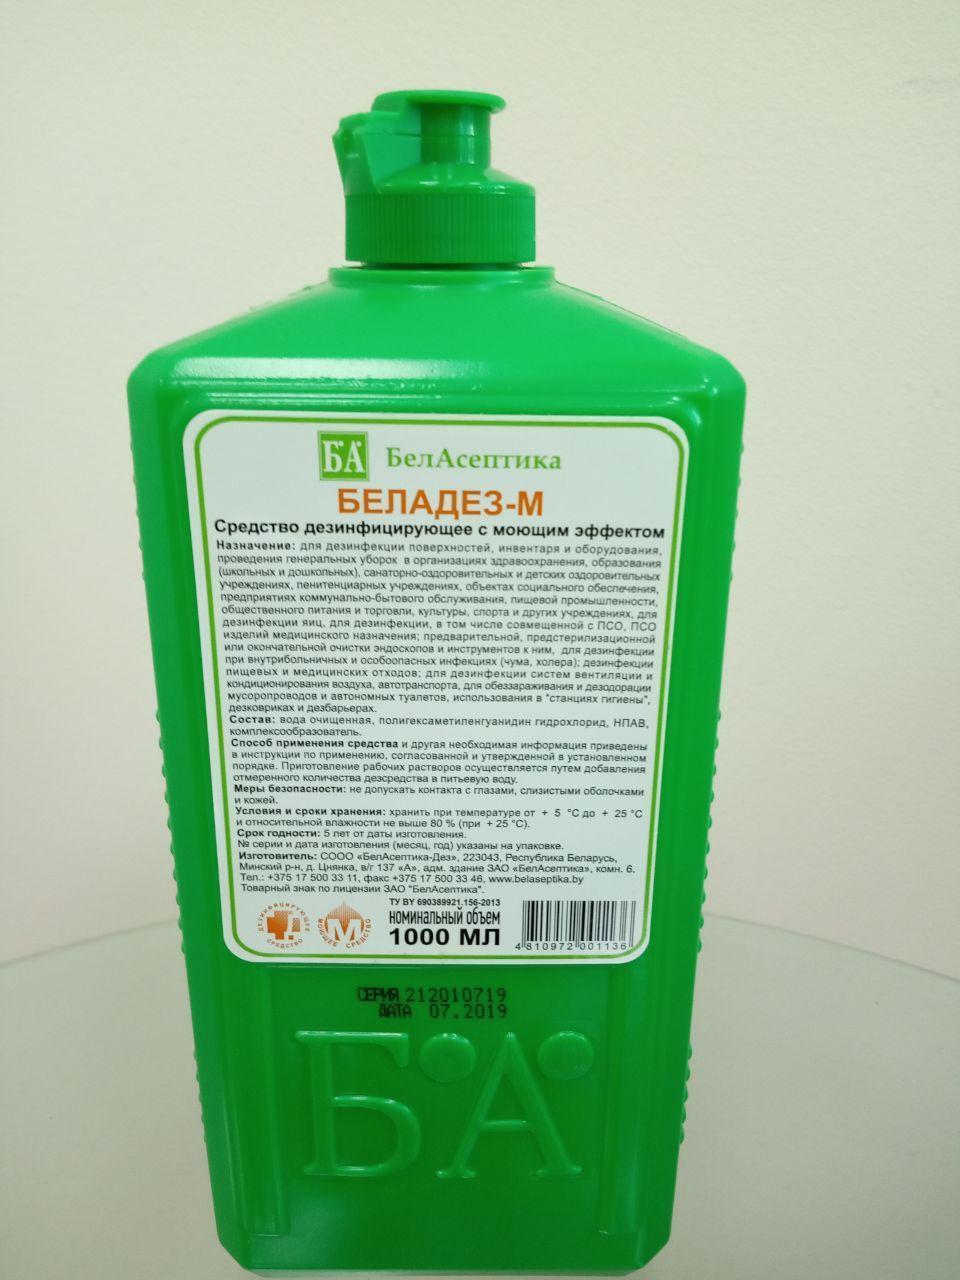 Беладез М, дезинфицирующее средство  (упаковка флип-топ)